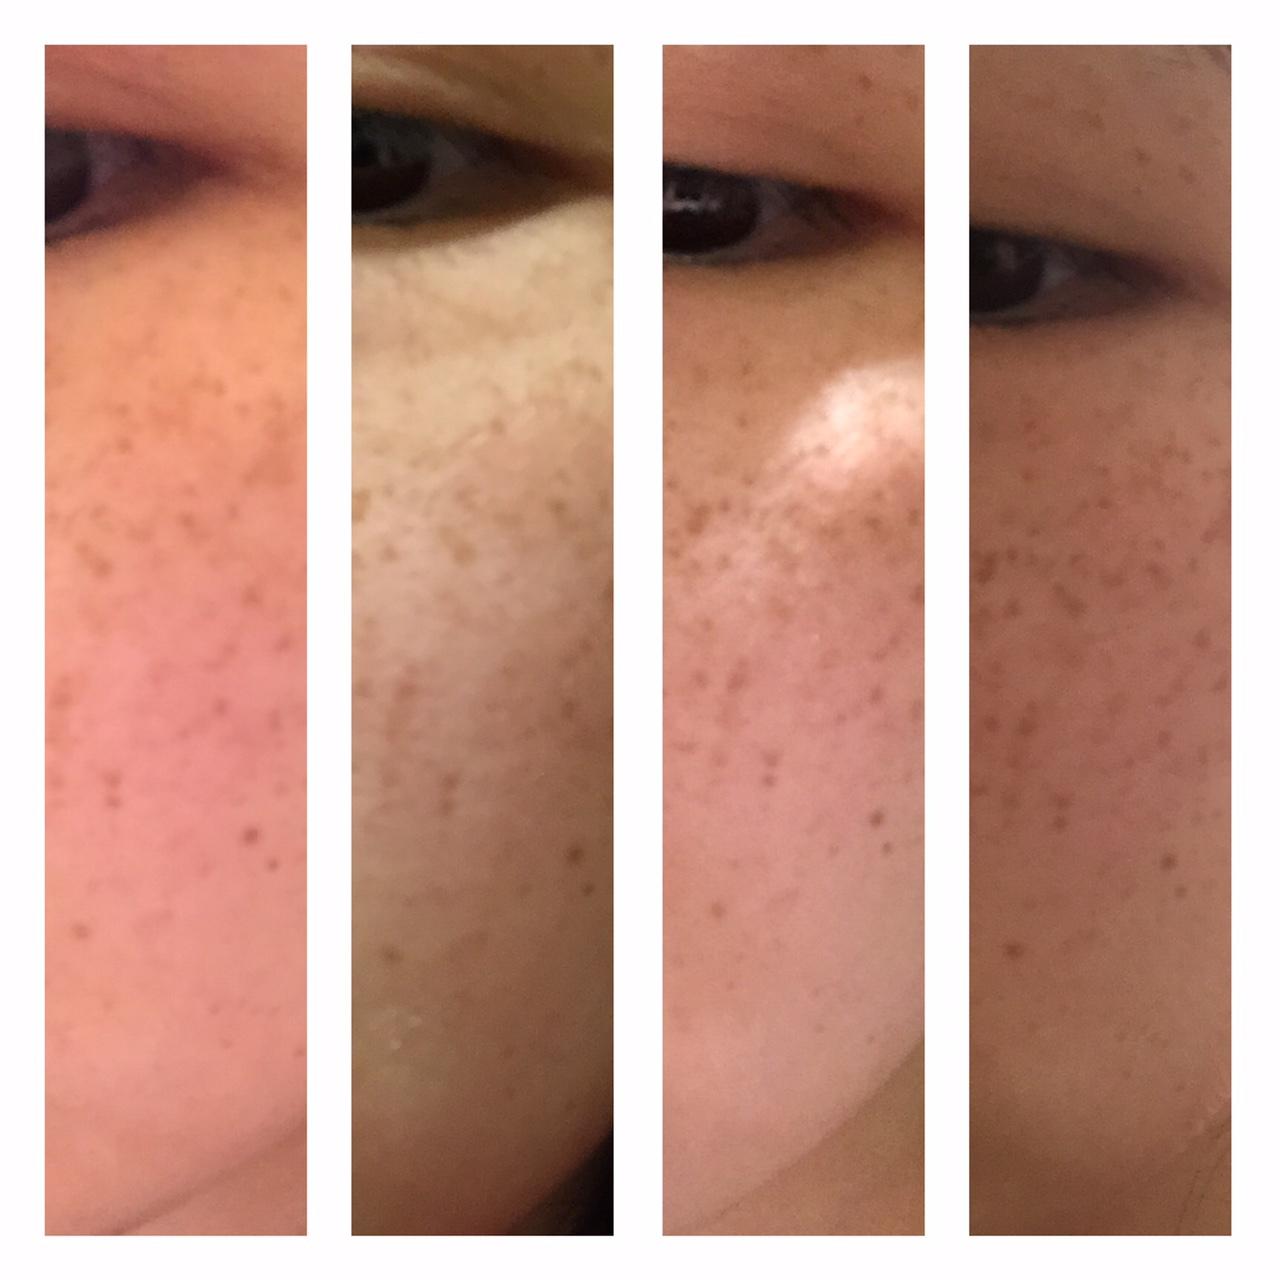 Dark spot corrector reviews by dermatologist - Vichy Proeven Advanced Daily Dark Spot Corrector Image Gallery 223 Reviews